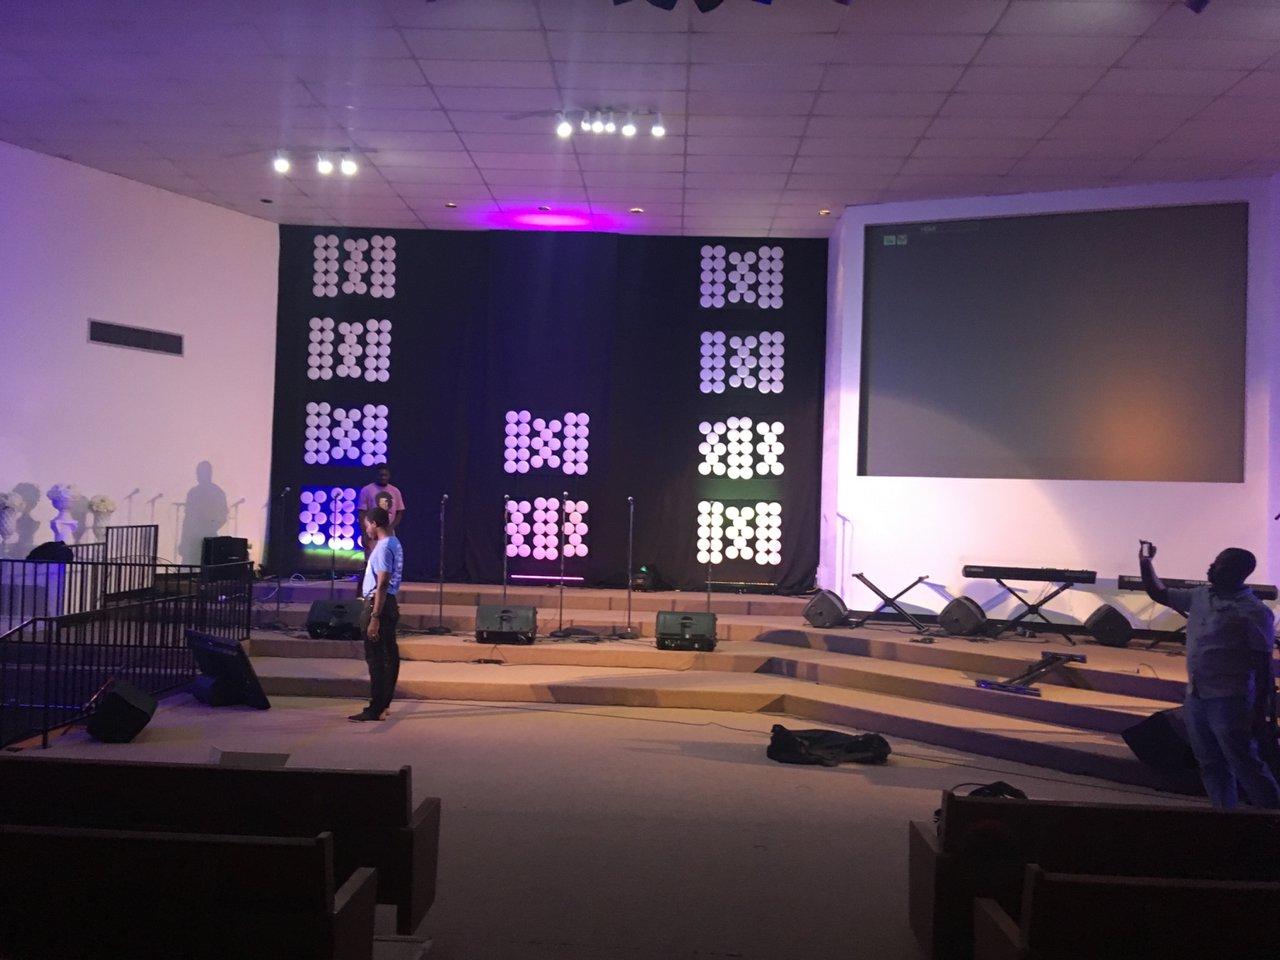 Pentecost International Church Service  photo 0B2671F8-39A5-48F6-A891-D3F648953677.jpg